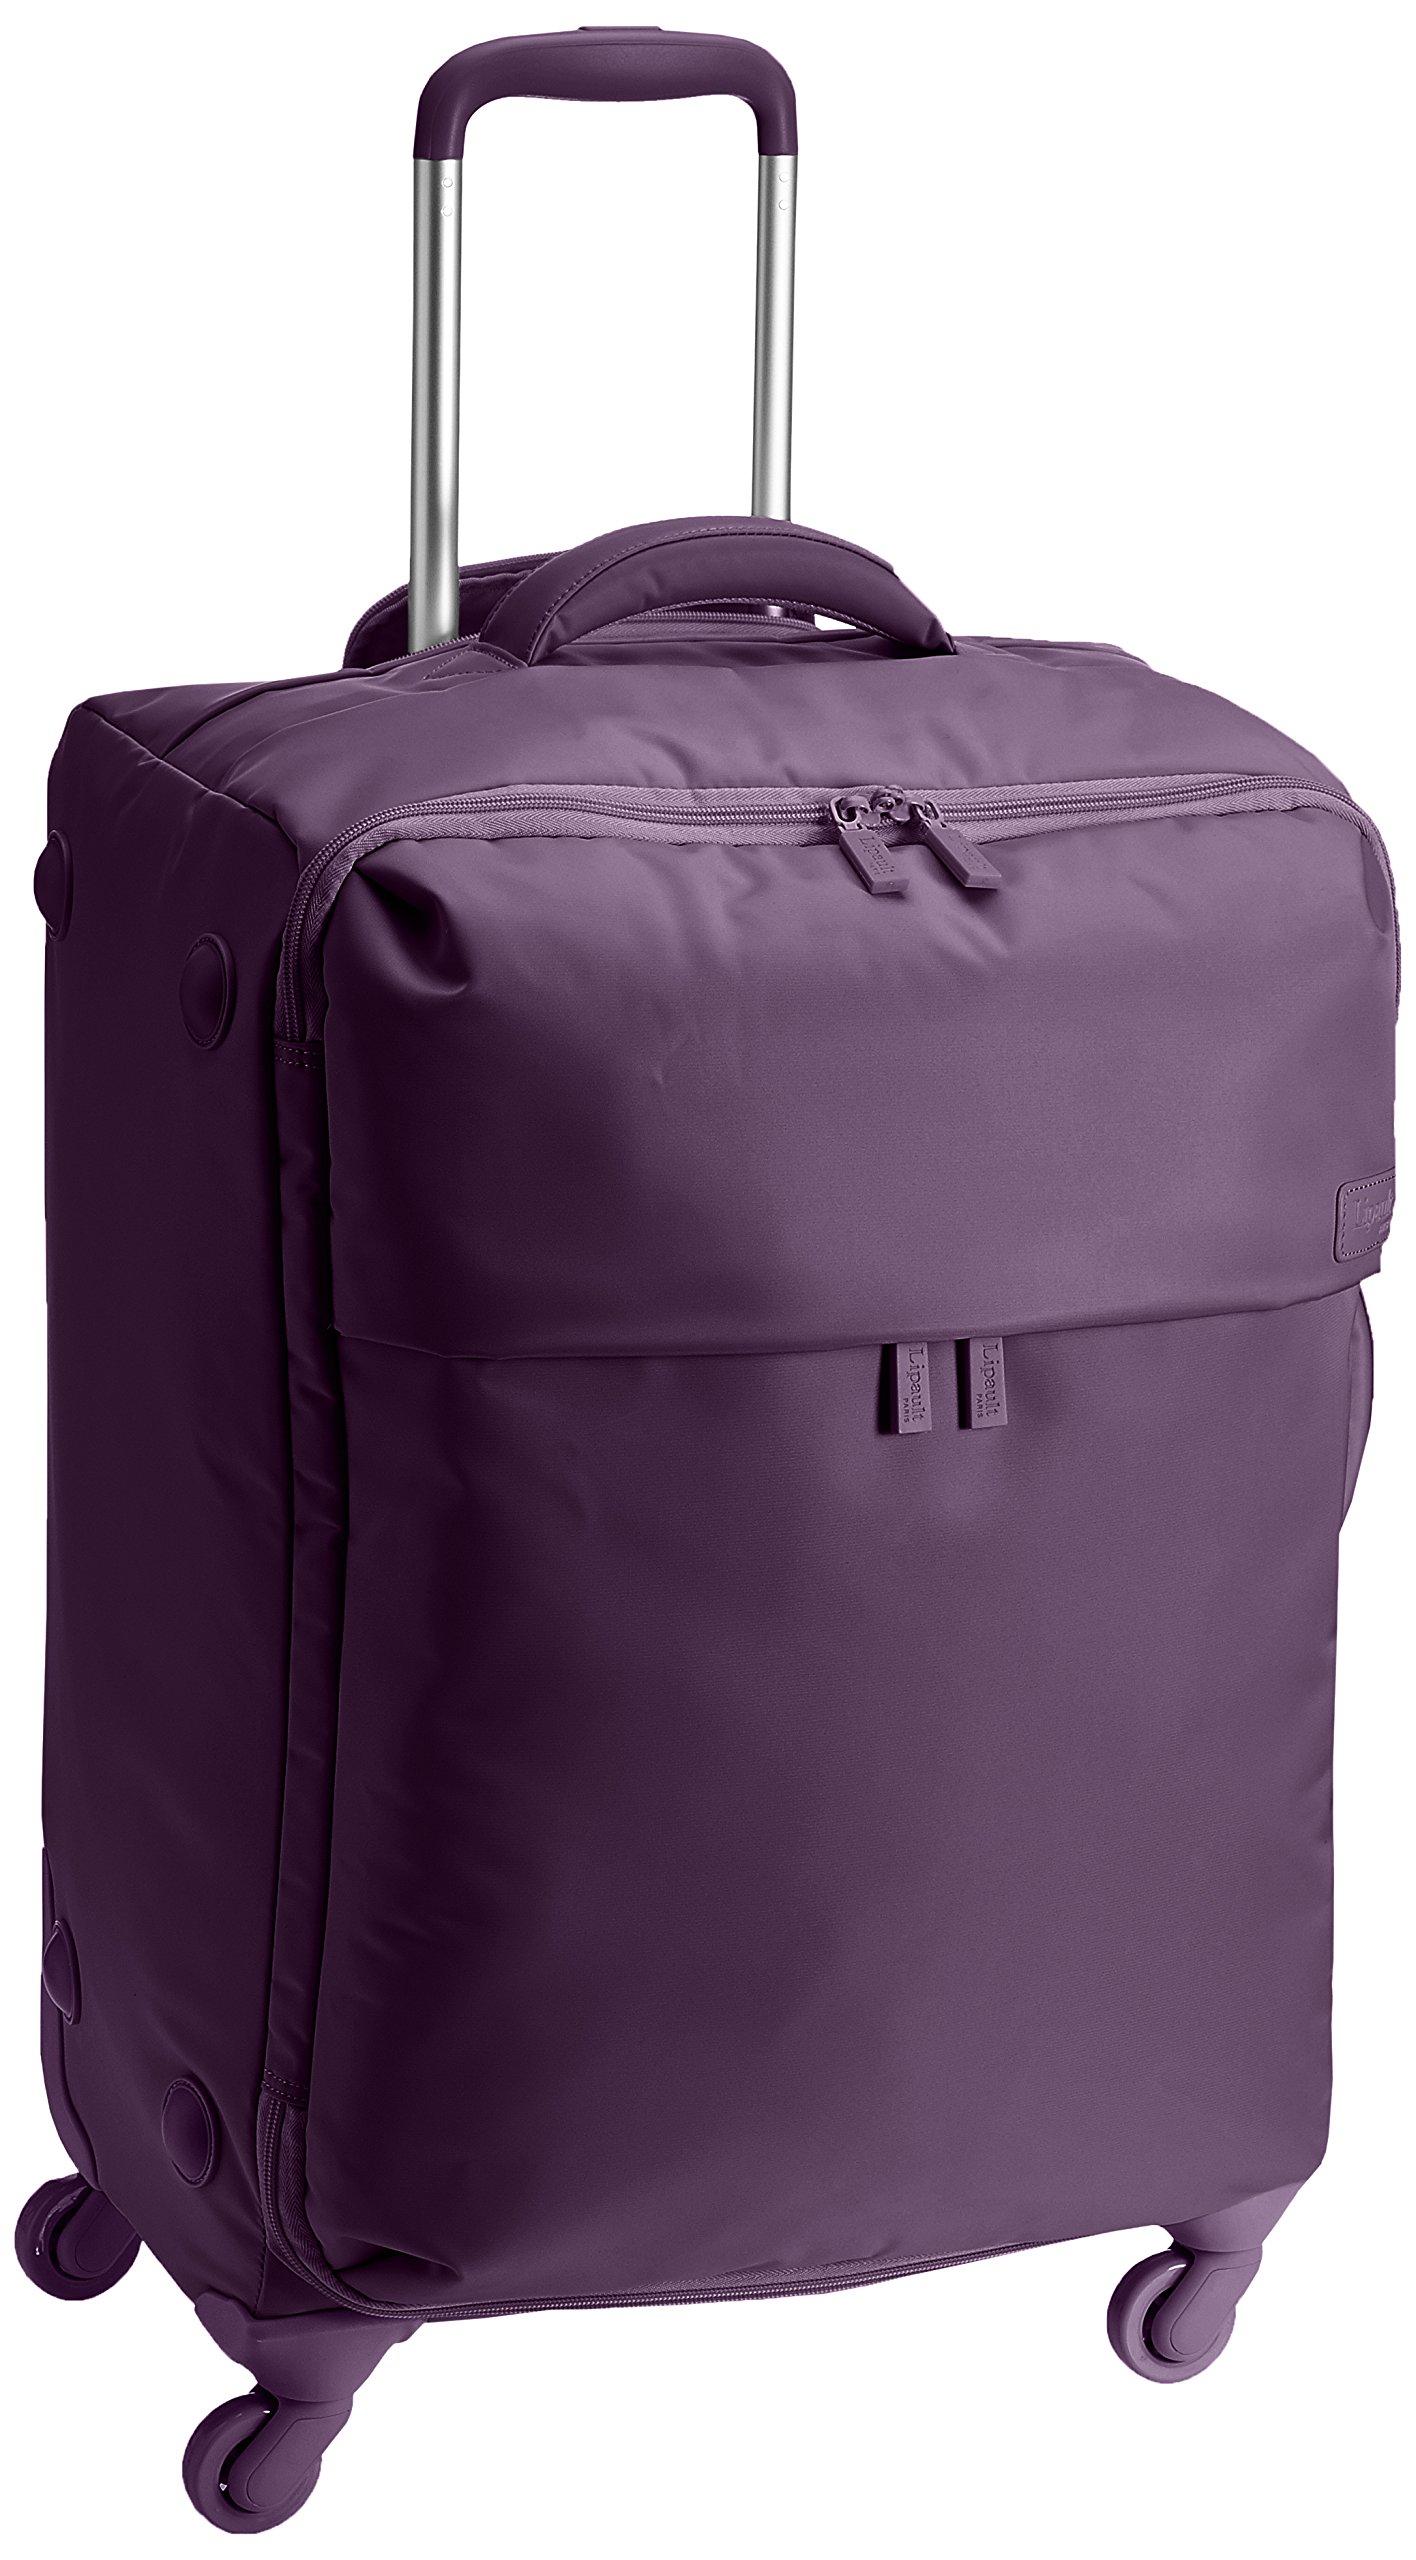 Lipault Original Plume 25'' Spinner Suitcase, Purple by Lipault